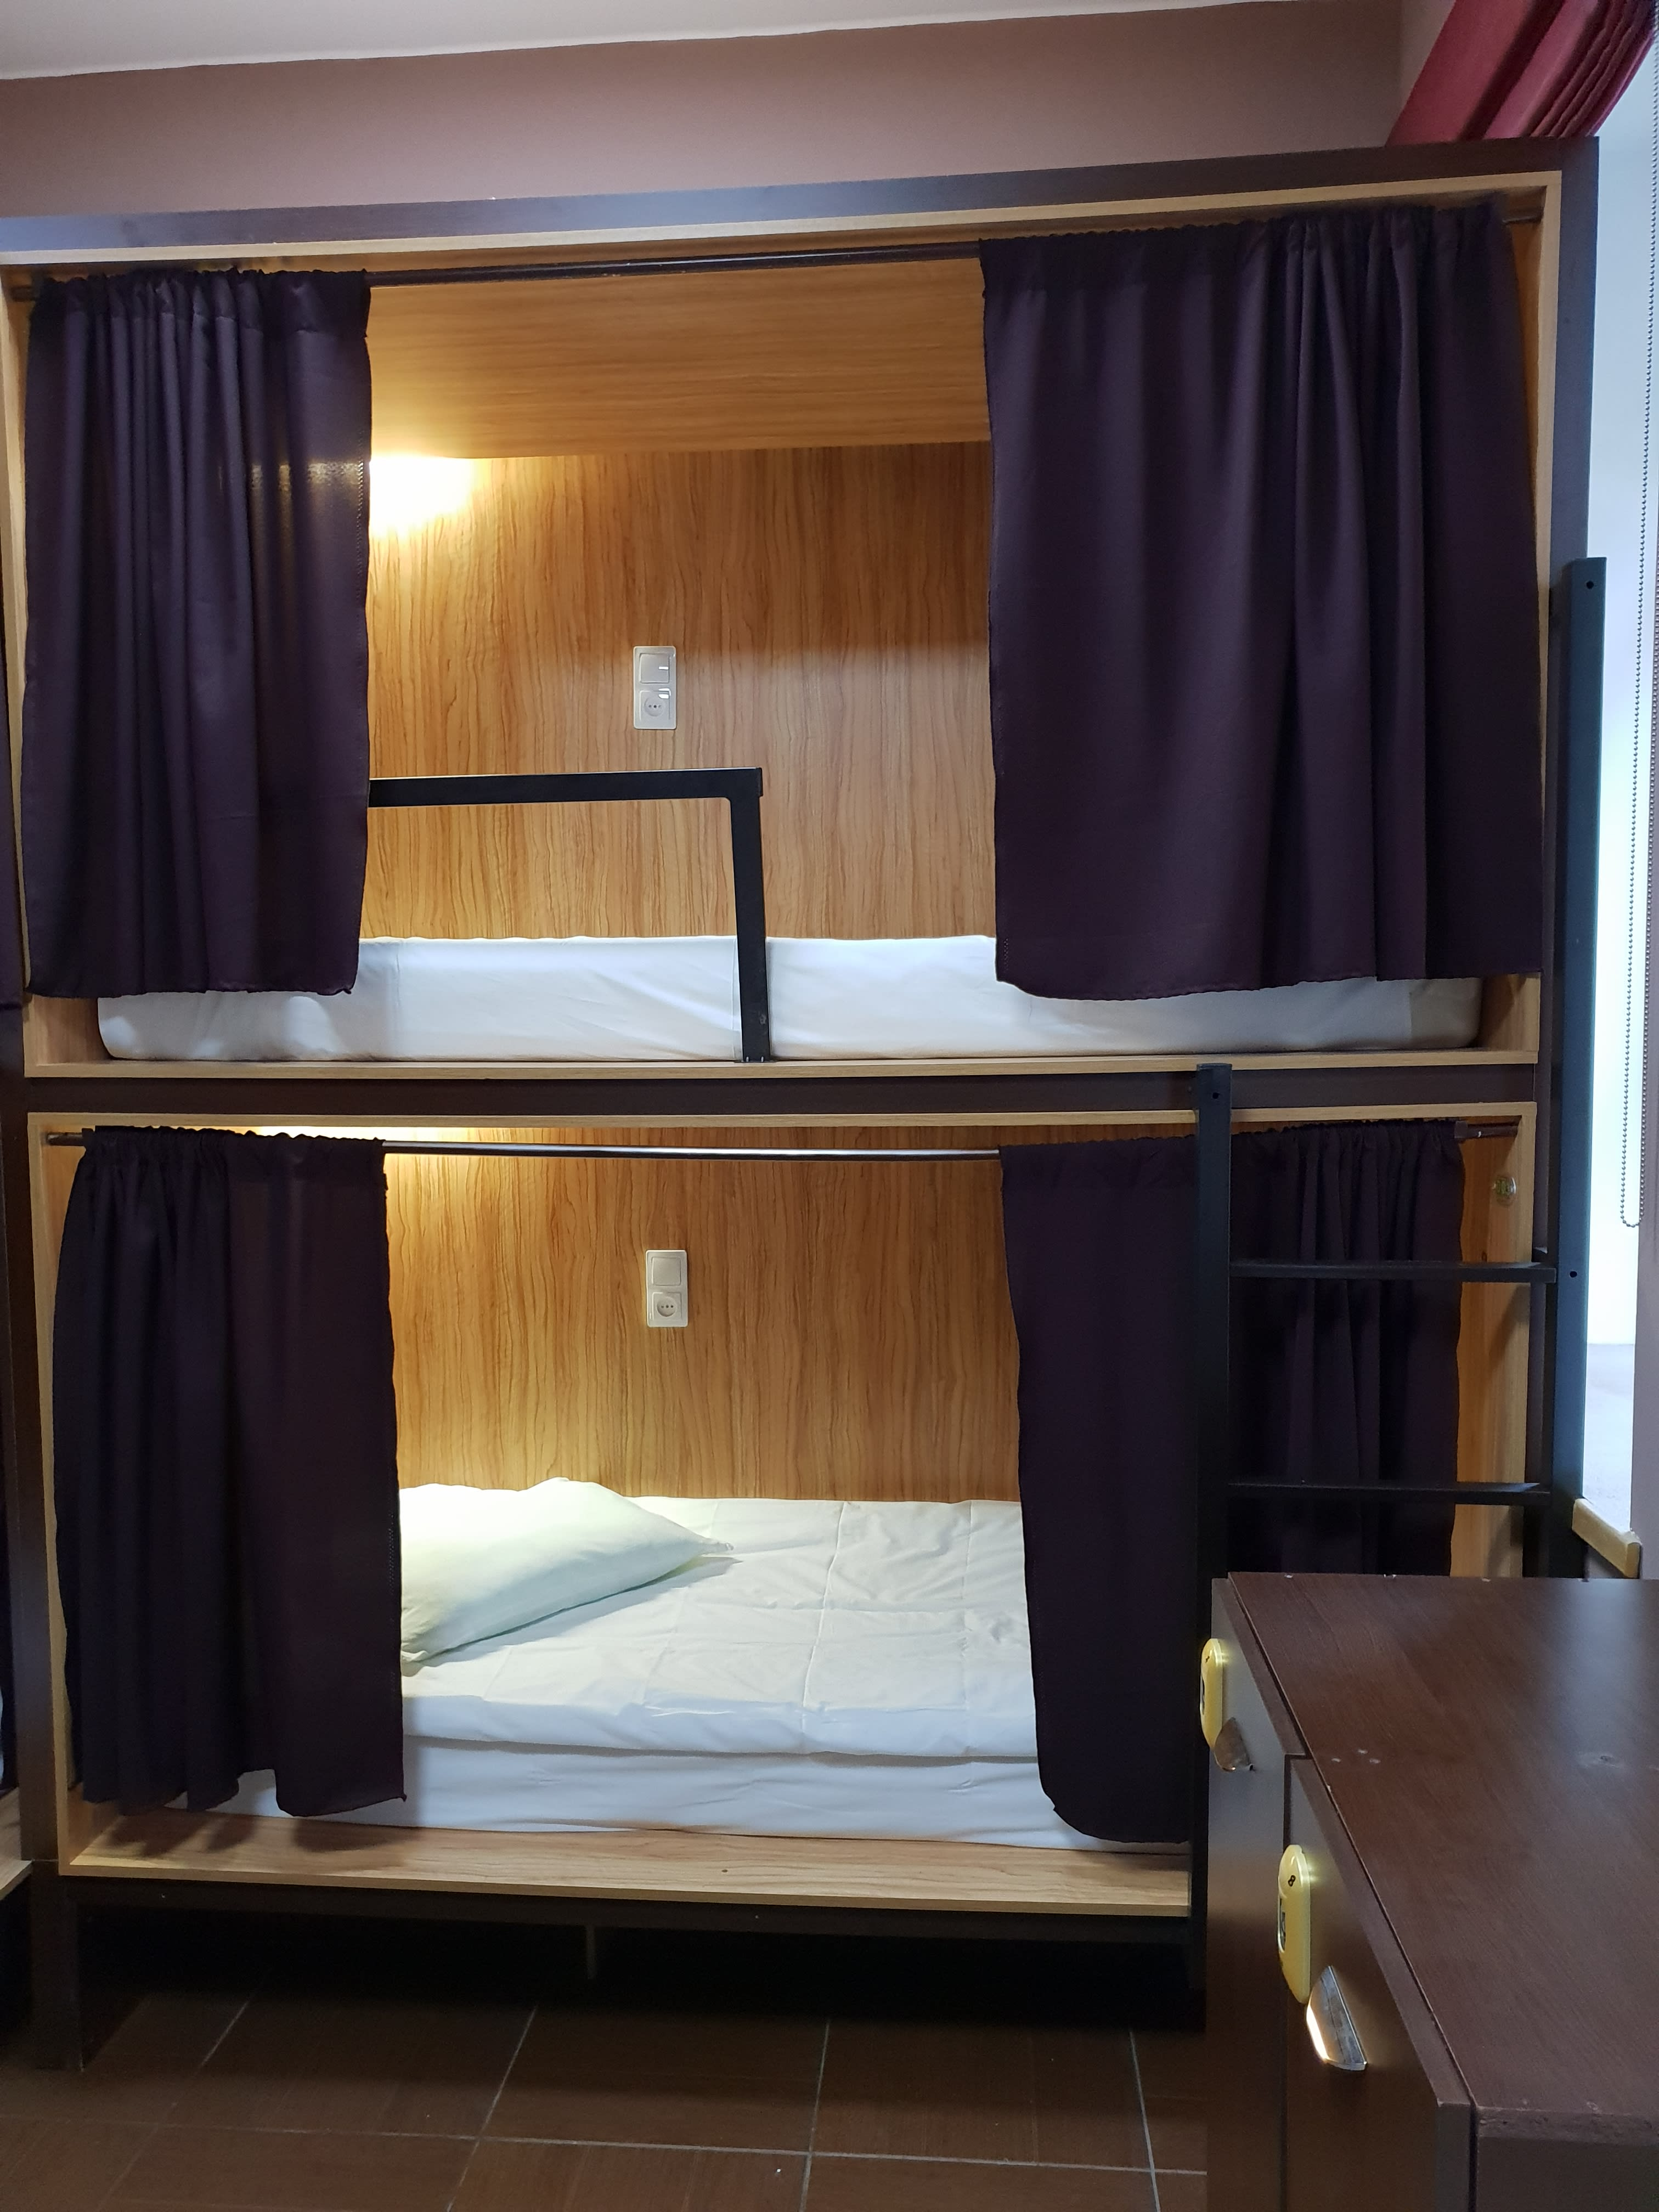 HOSTEL - YaroMir Hostel